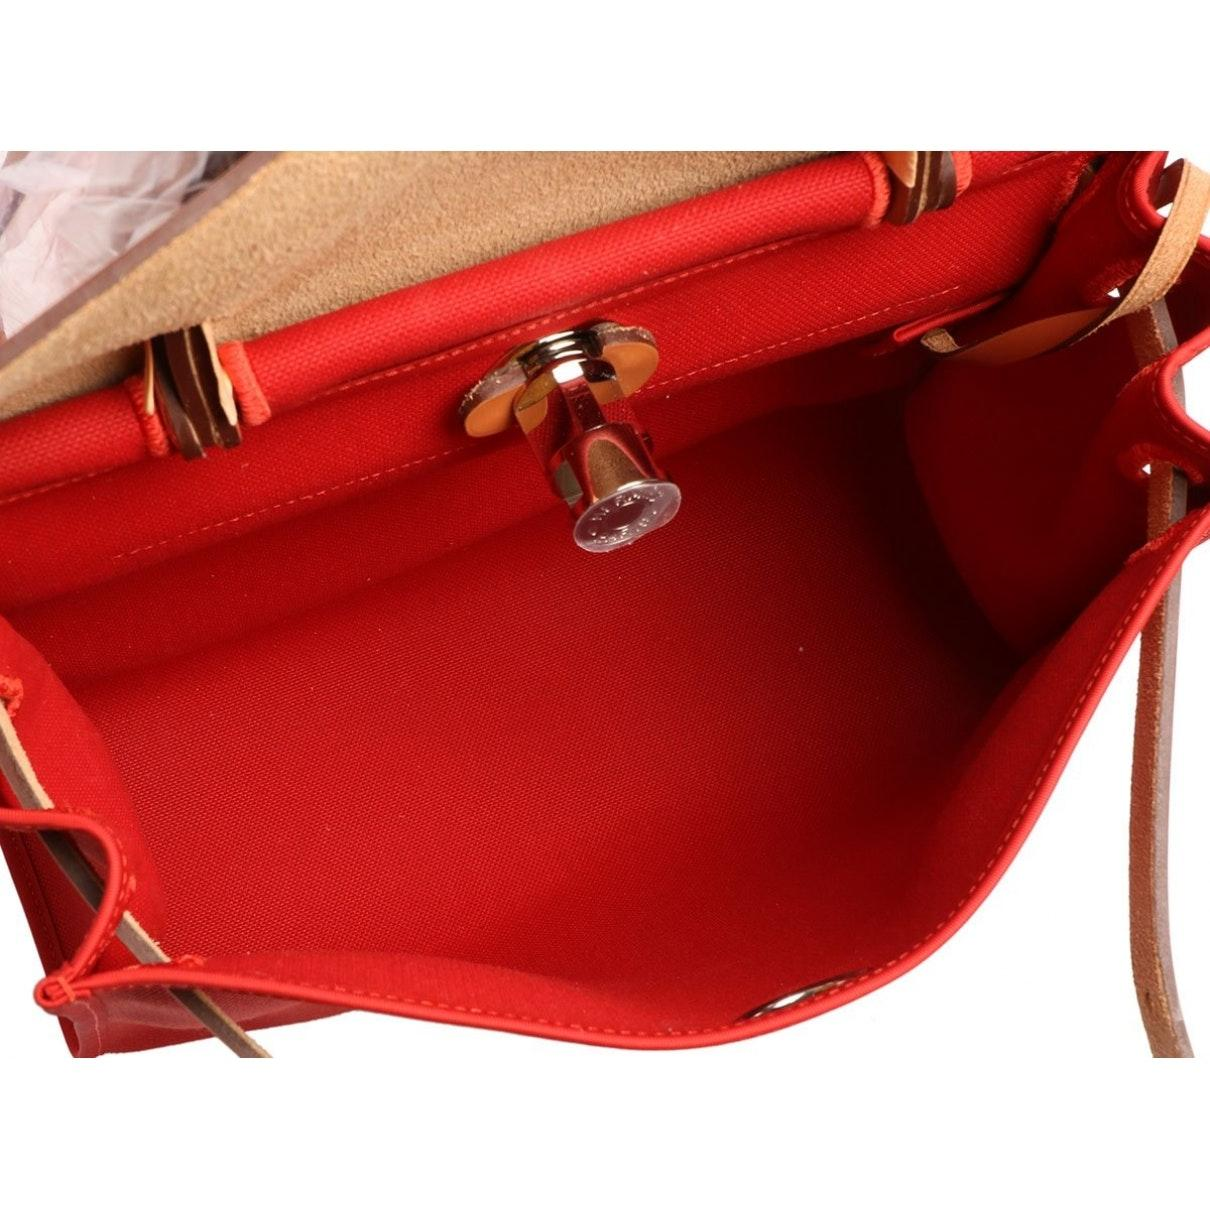 Sac à main Herbag en Toile Rouge Hermès en coloris Rouge rLbT